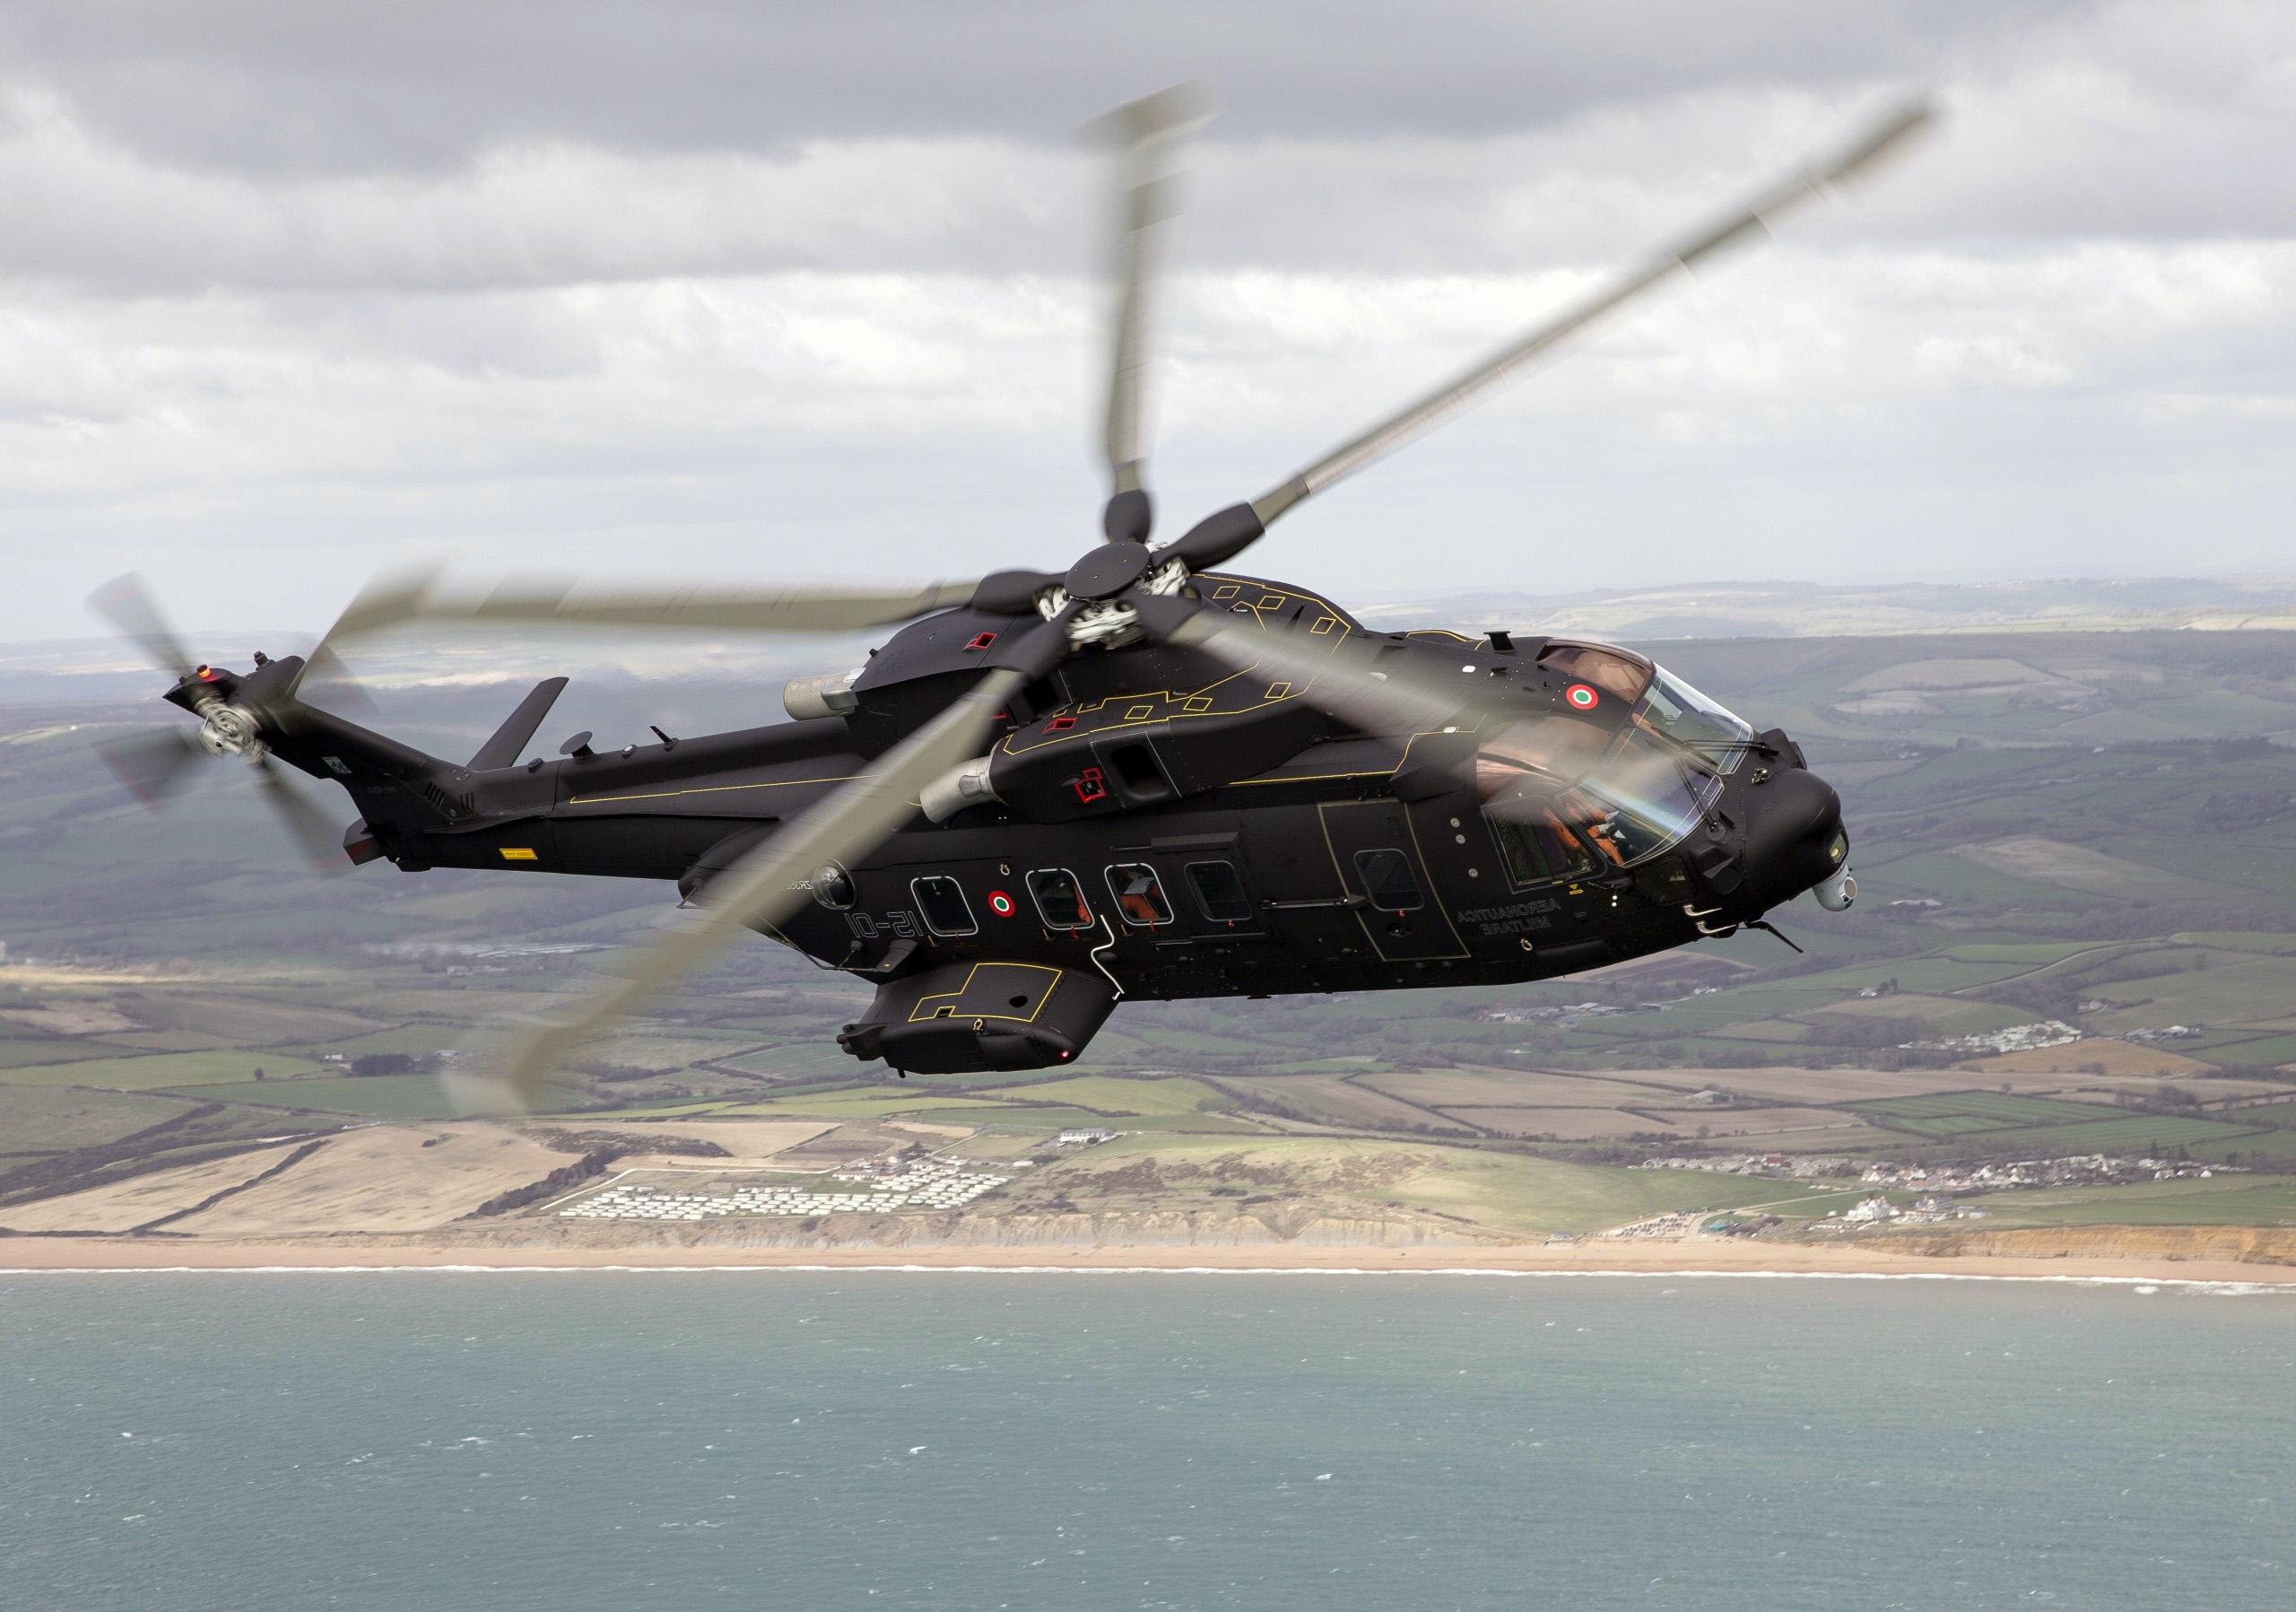 HDoboi.Kiev.ua - Боевой вертолет HH-101A Caesar, вертолет обои смартфон